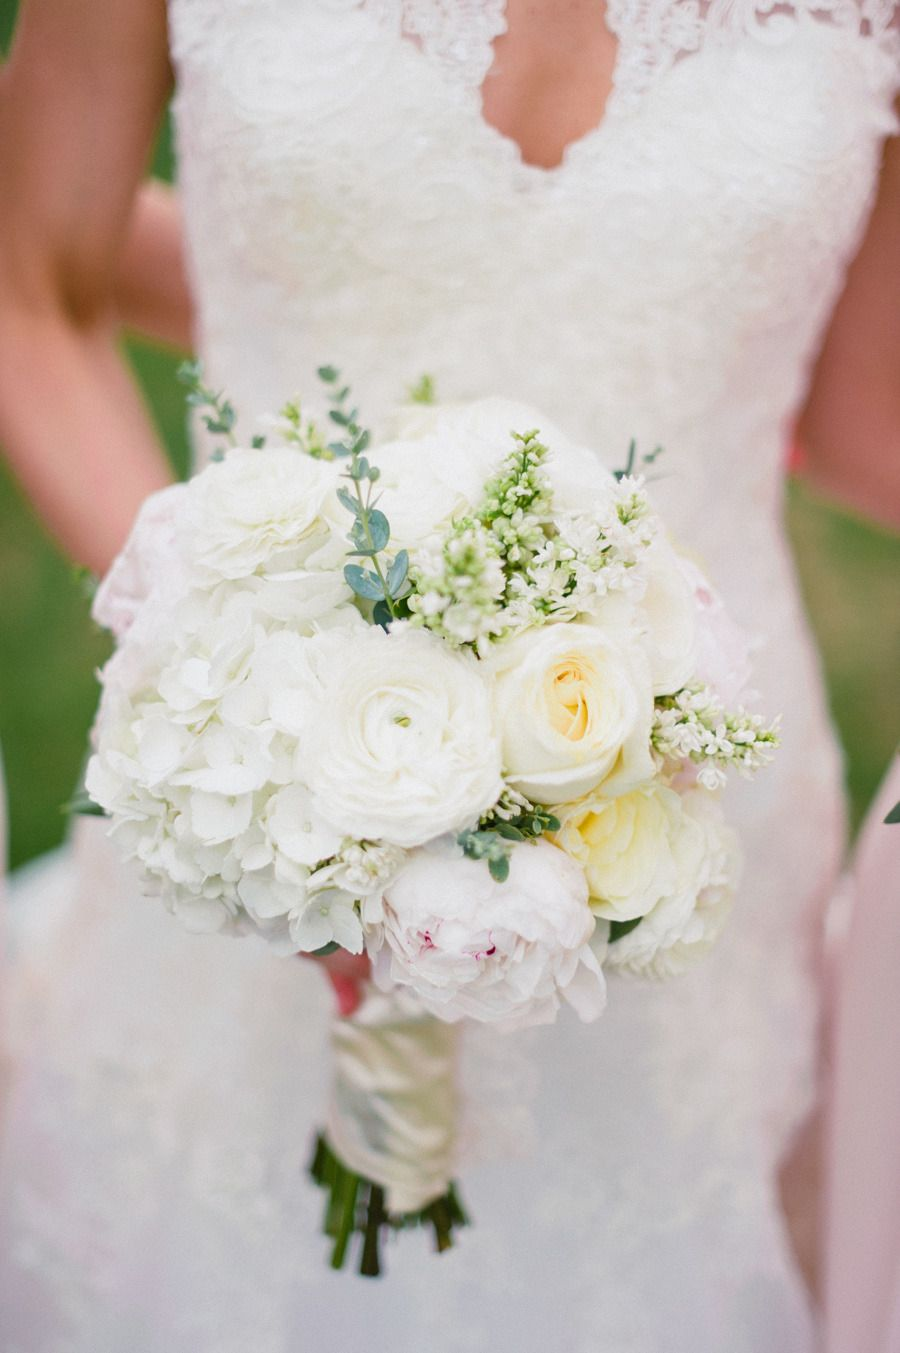 Sioux Falls South Dakota Wedding At Steever House Bed Breakfast Wedding Flower Inspiration Wedding Floral Wedding